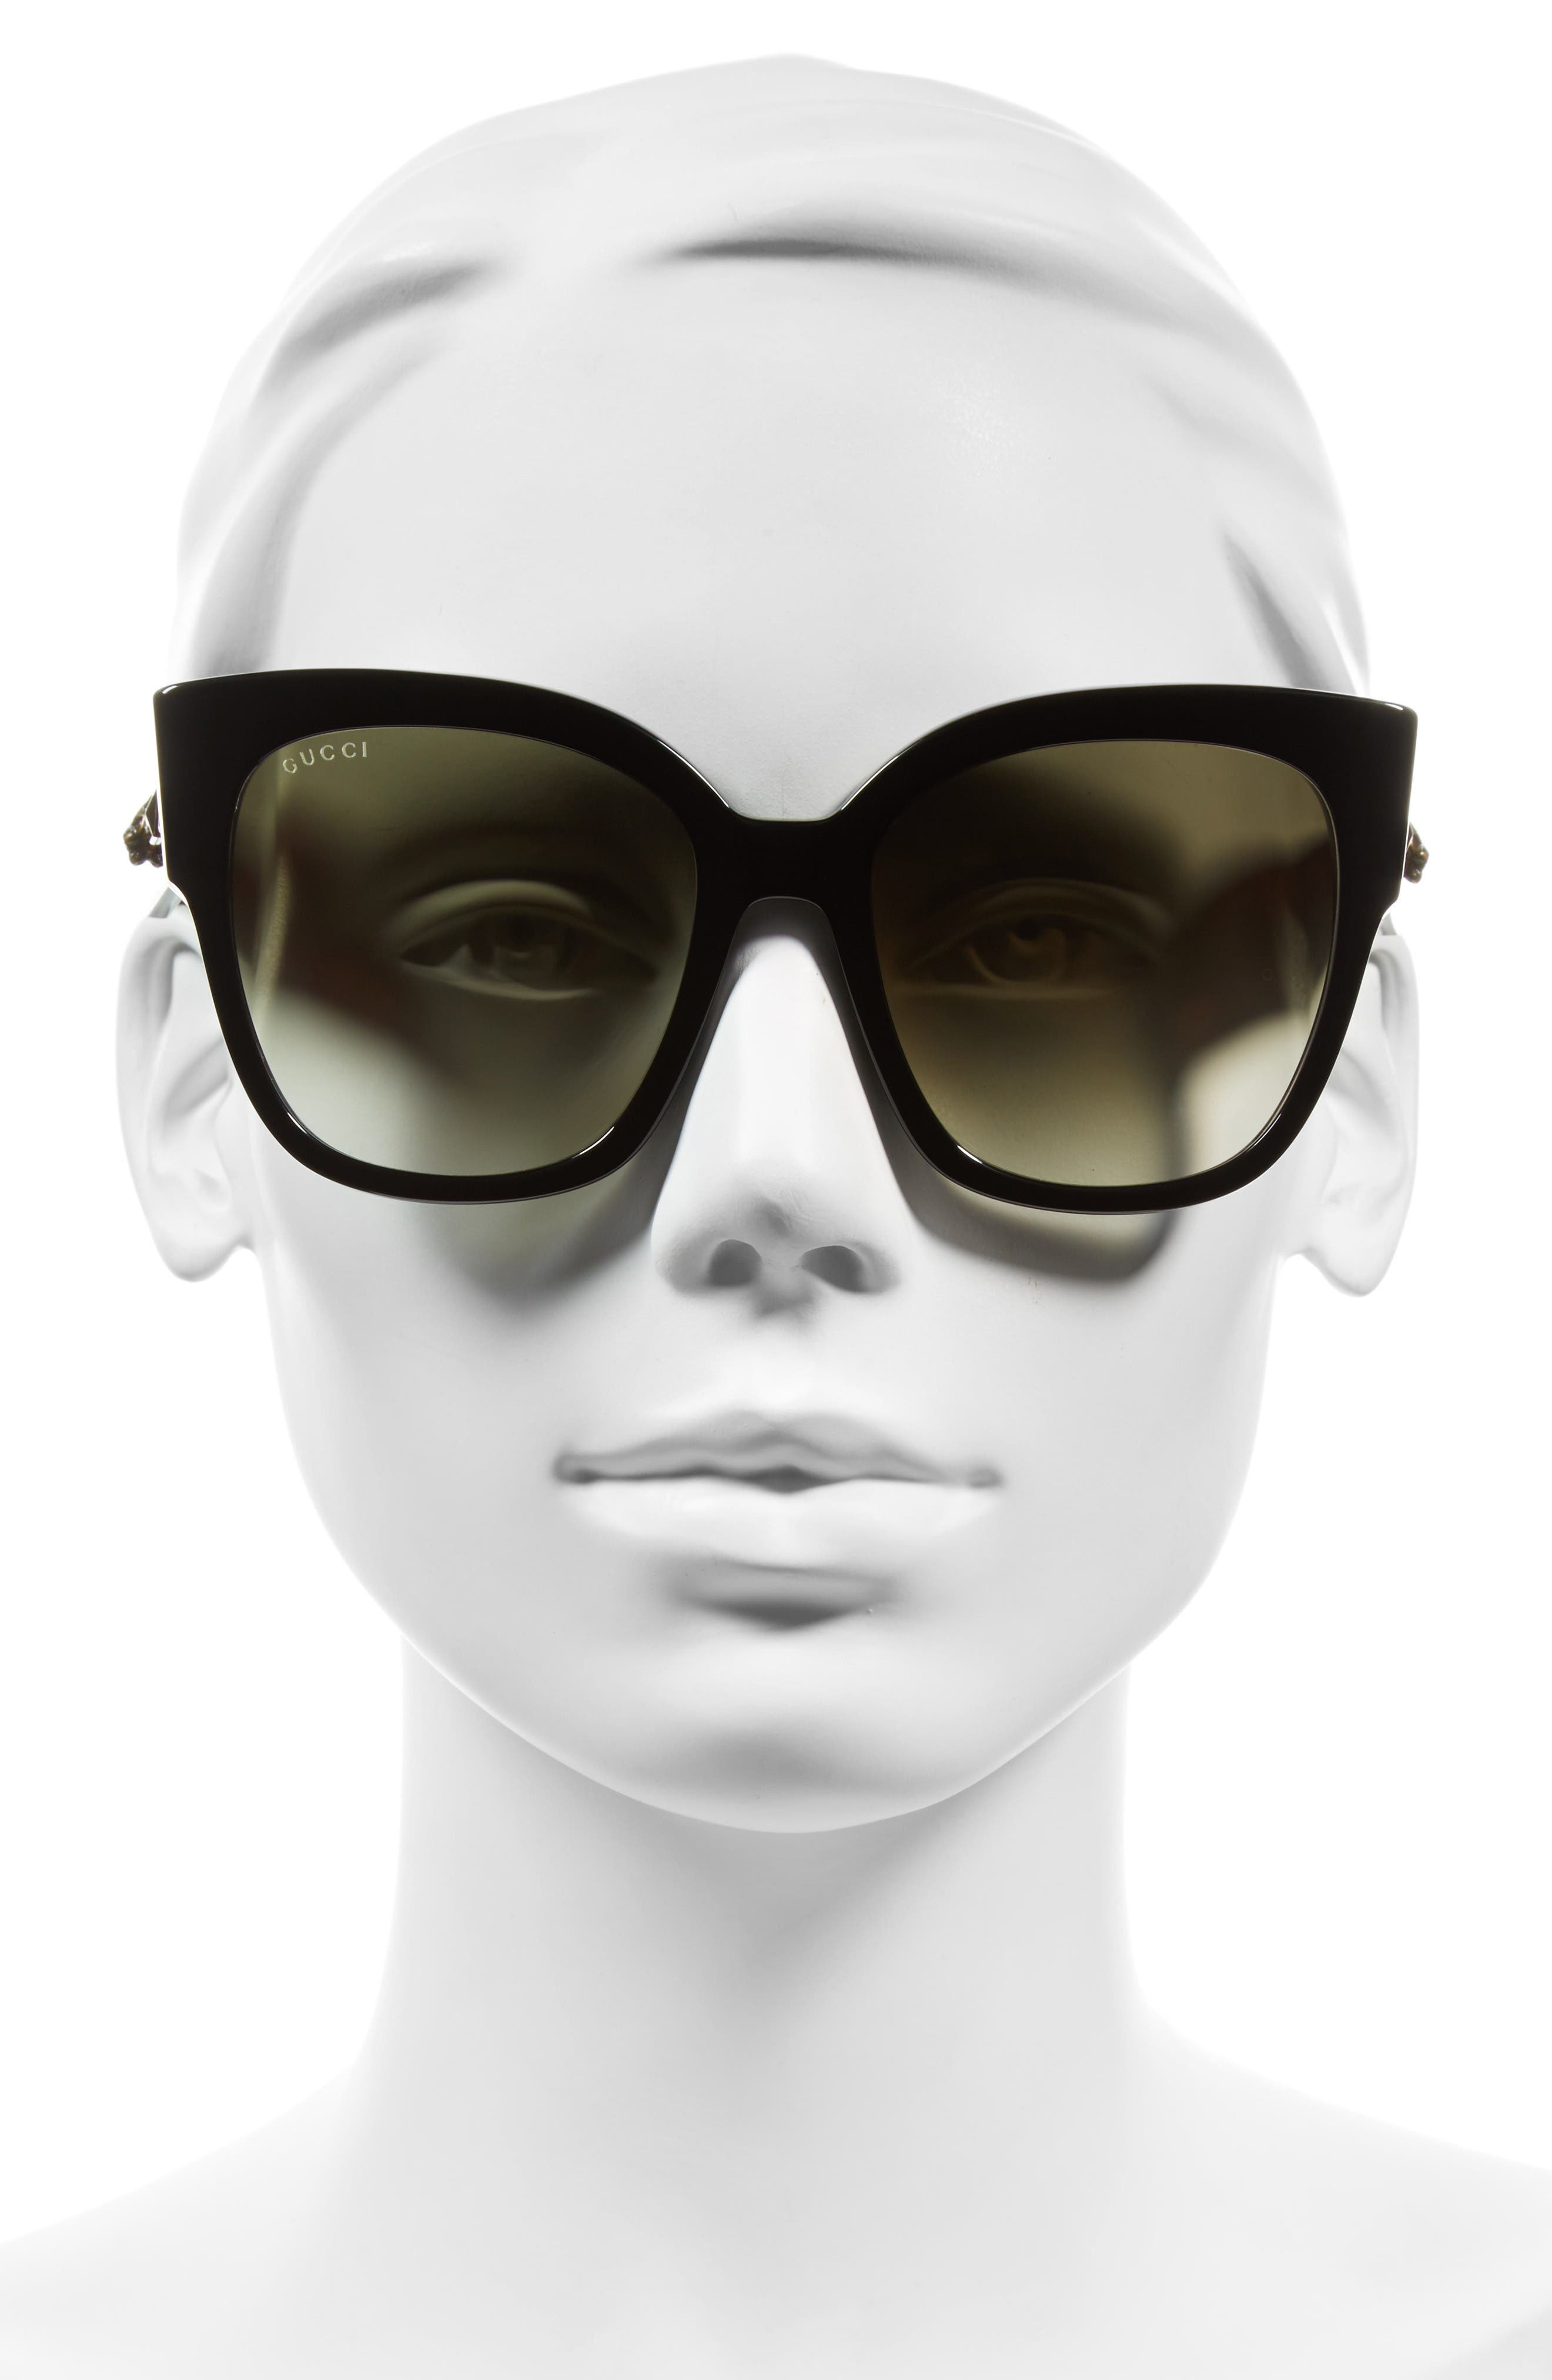 55mm Butterfly Sunglasses,                             Alternate thumbnail 2, color,                             Black/ Green